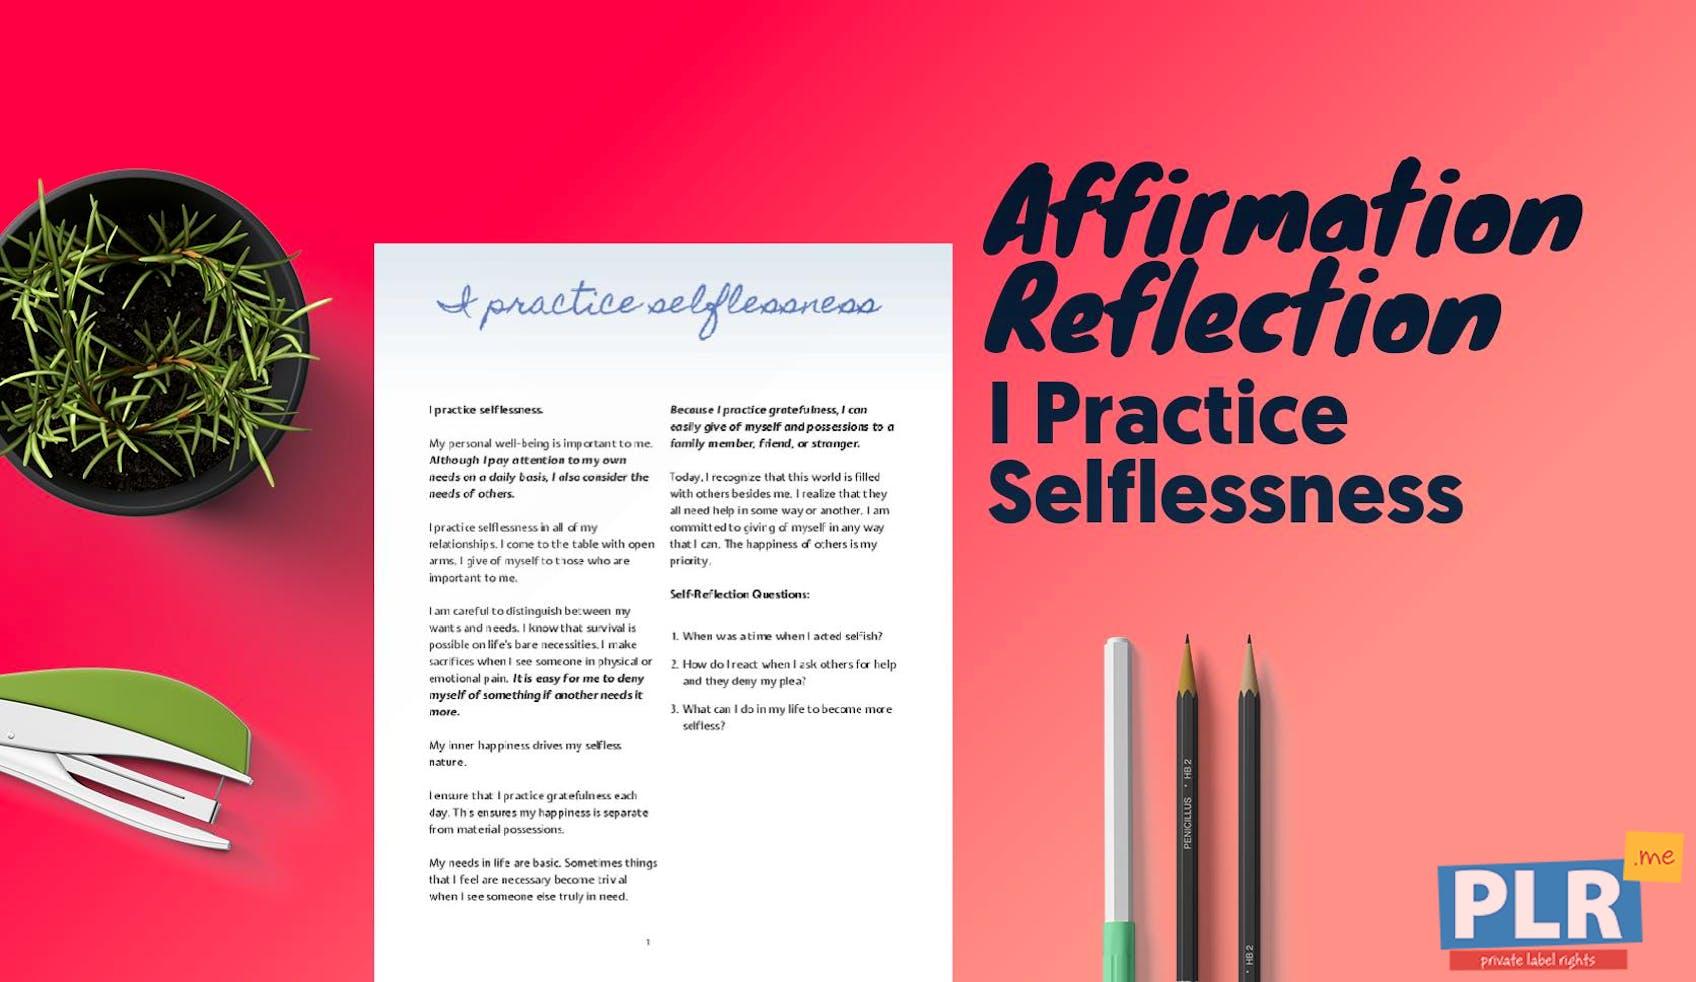 I Practice Selflessness